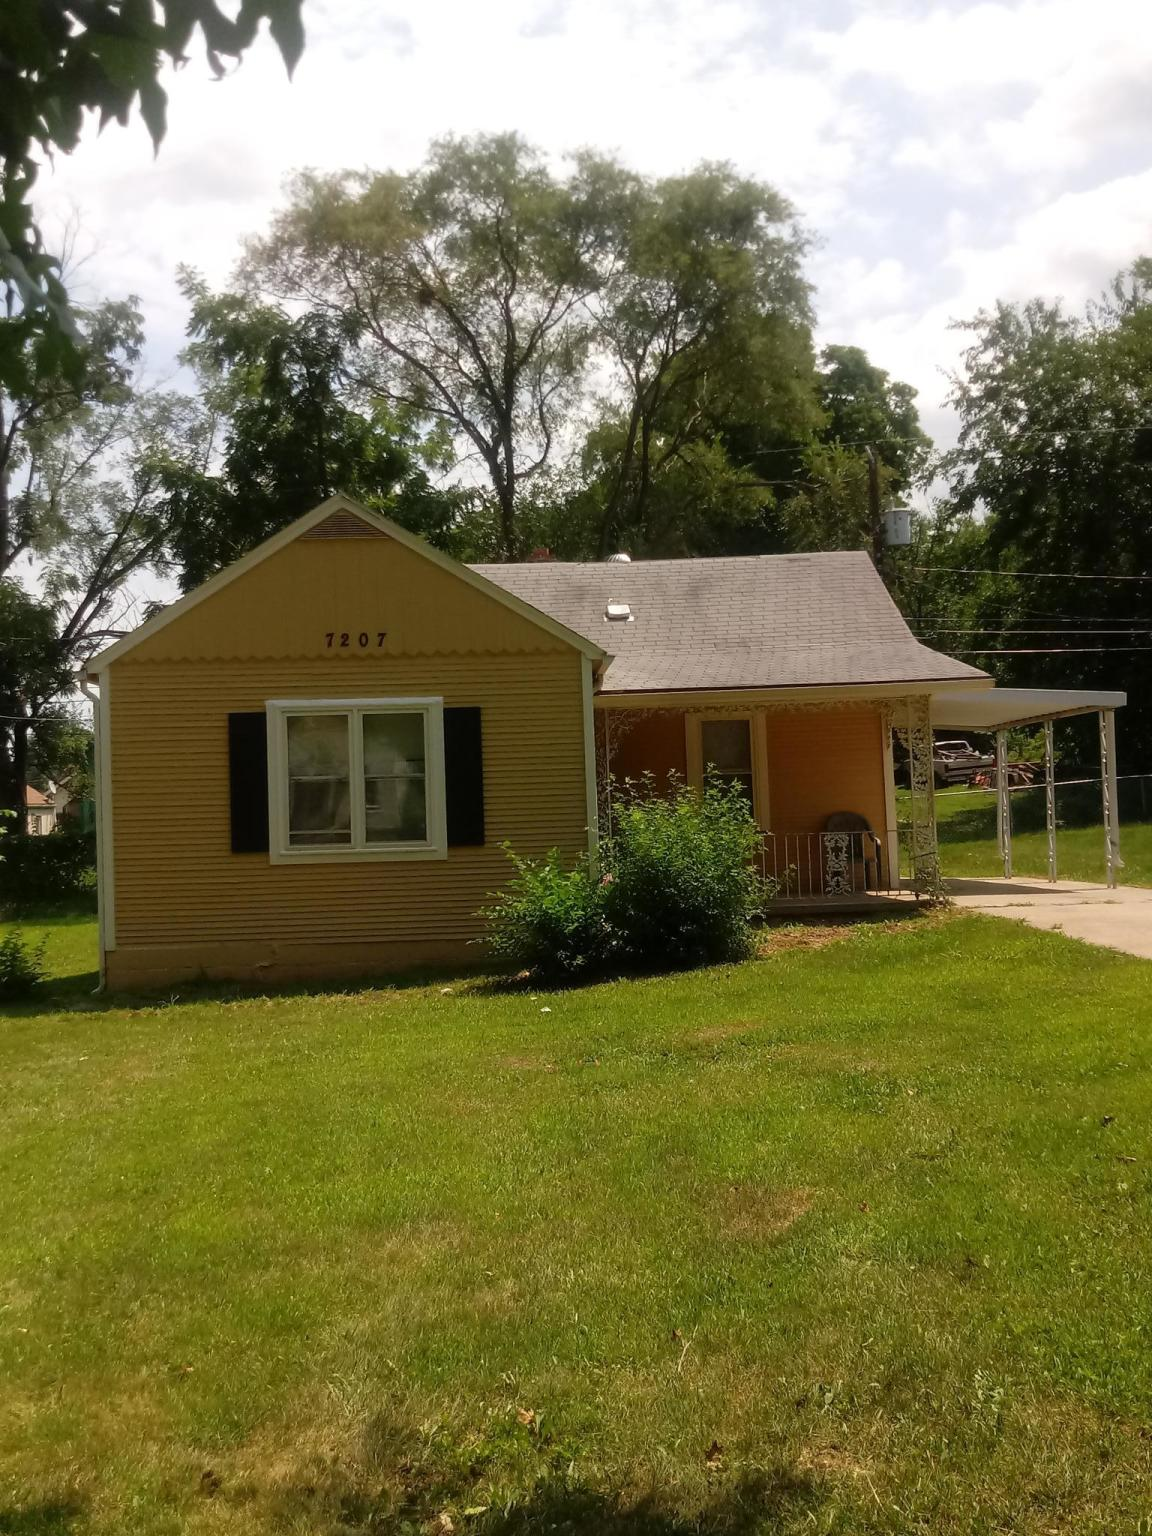 7207 Olive St, Kansas City, MO 64132 For Rent   Trulia